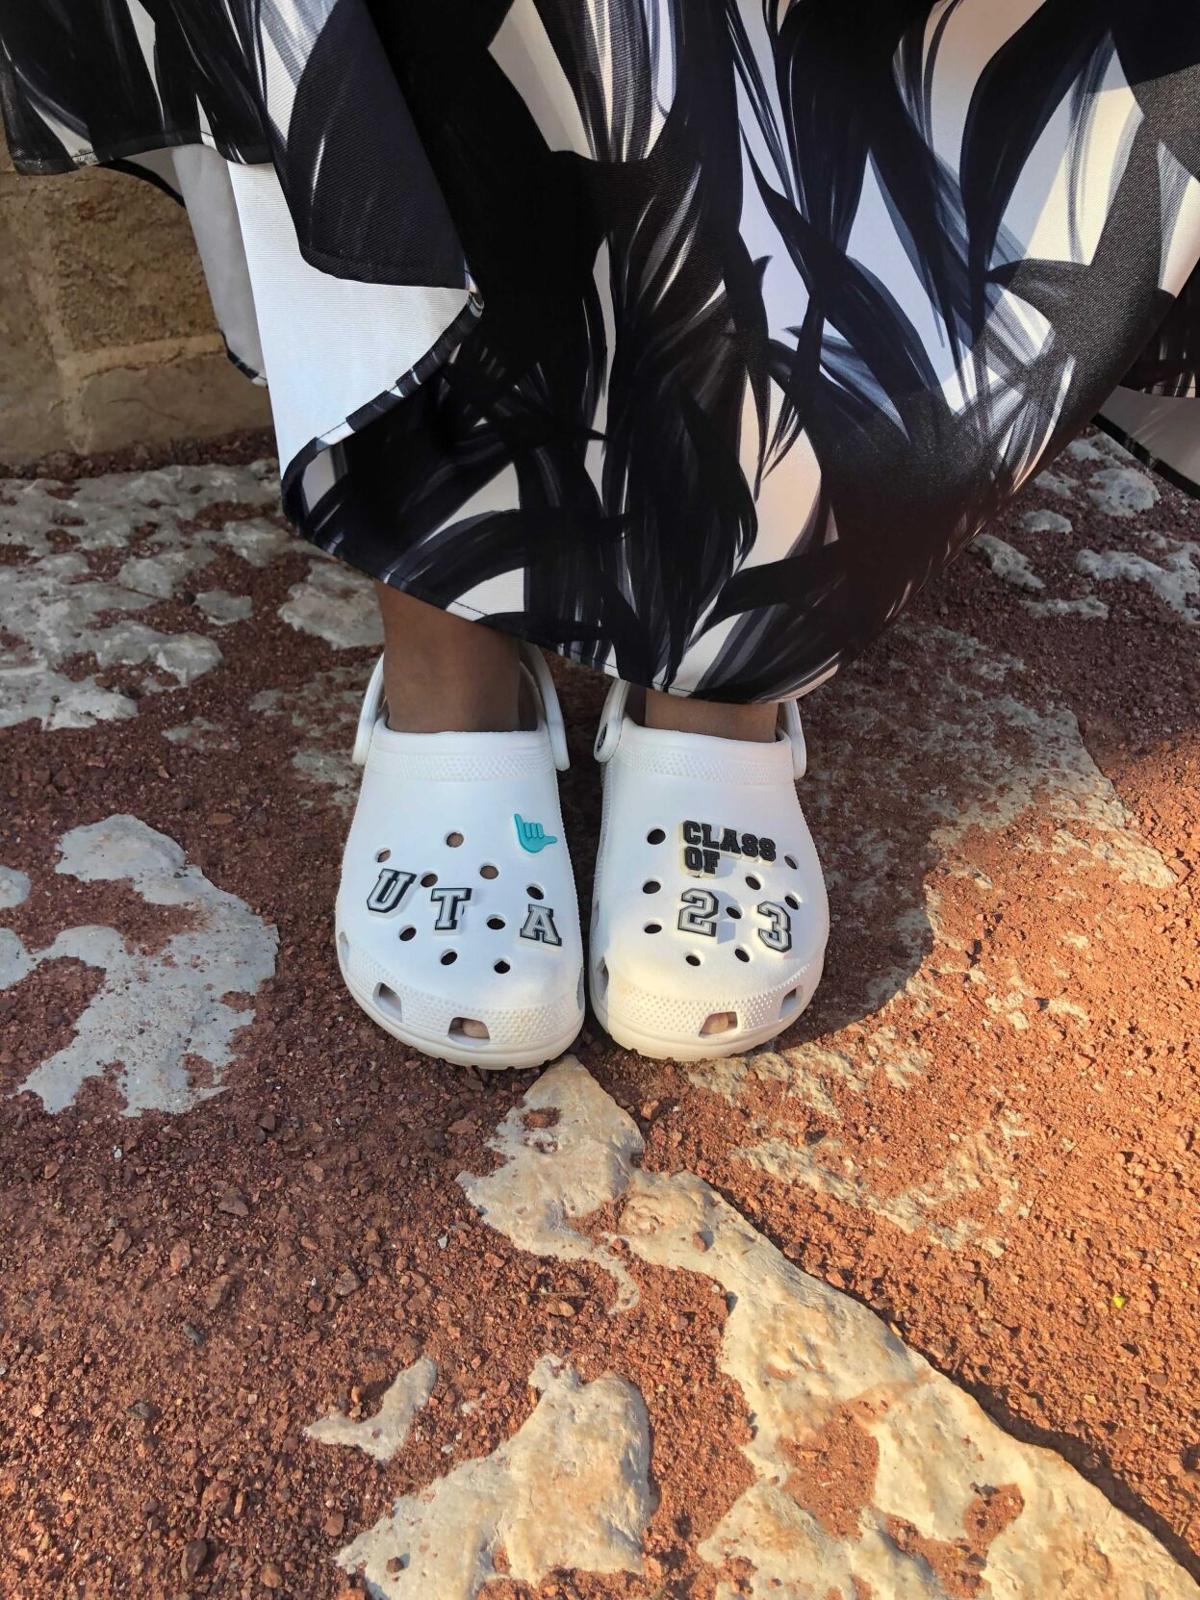 Comfortable, versatile, trendy: Crocs make iconic comeback